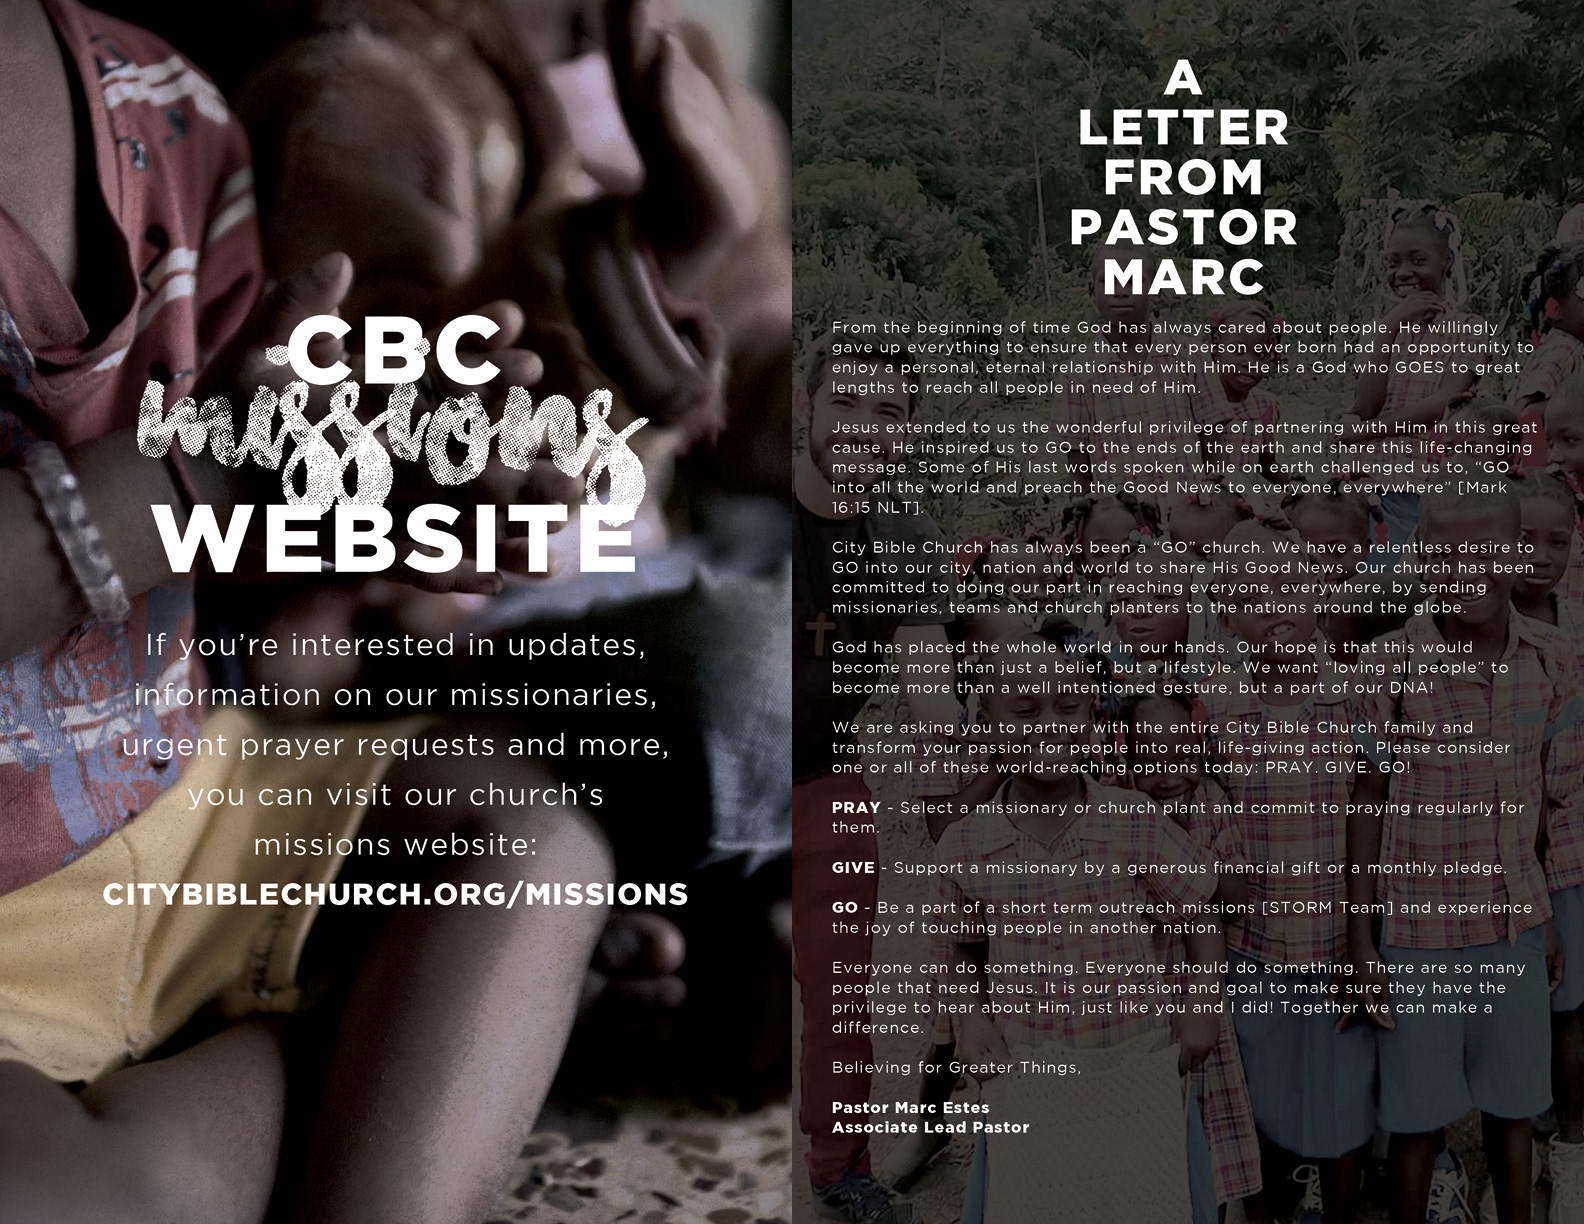 City Bible Church - World Sunday Booklet 2016 on Behance